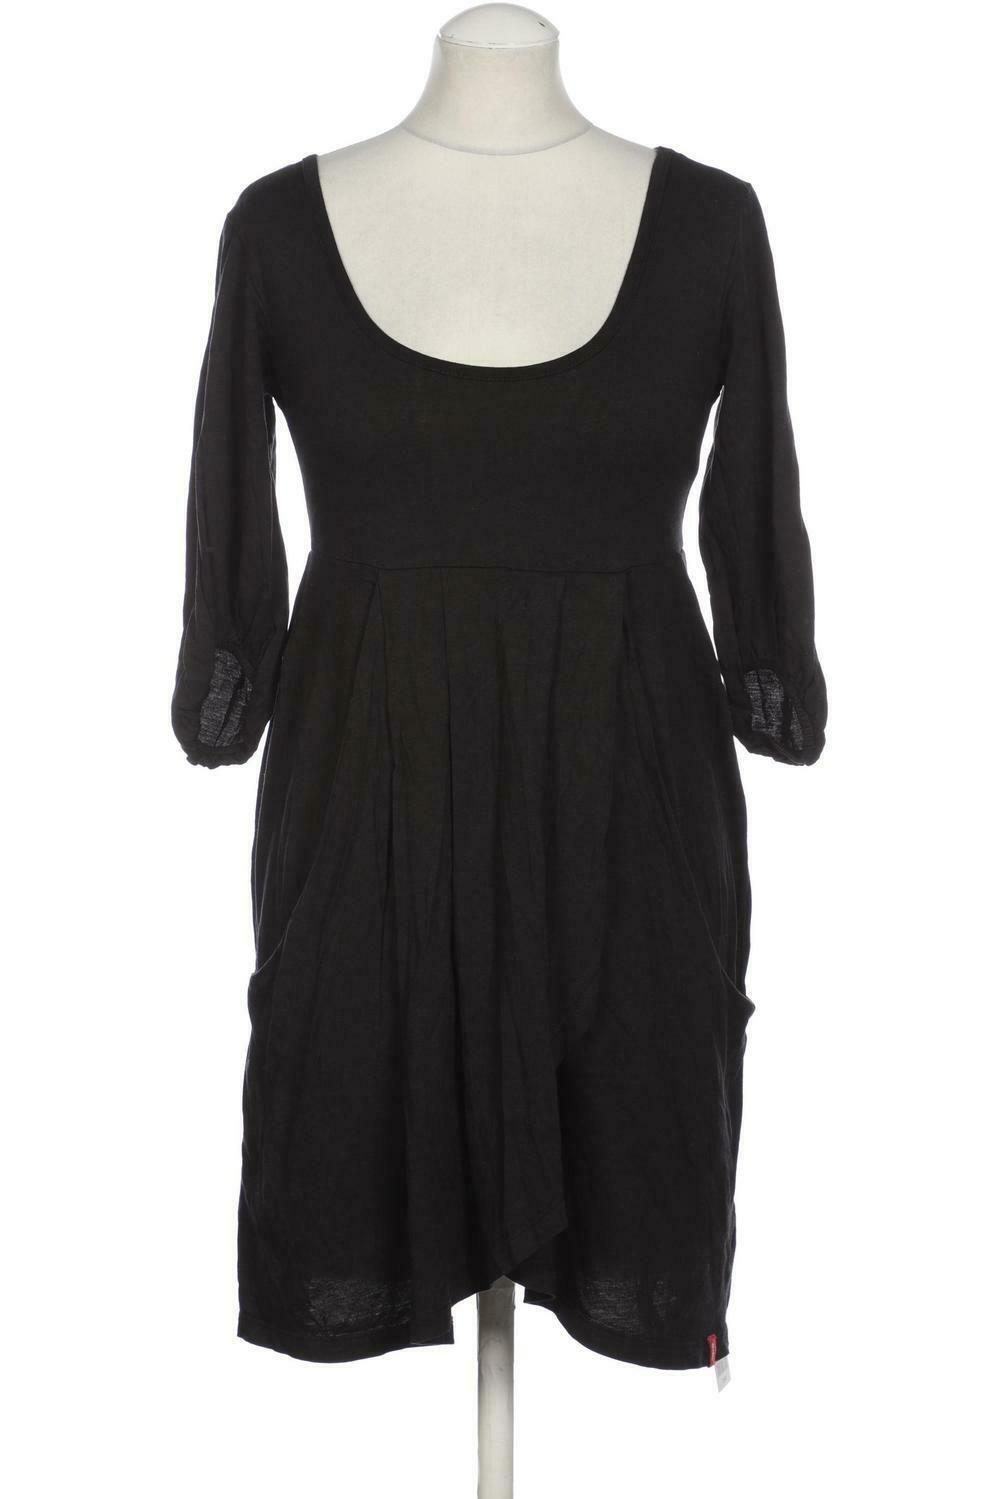 Esprit Kleid Damen Dress Damenkleid Gr. M Baumwolle Viskose